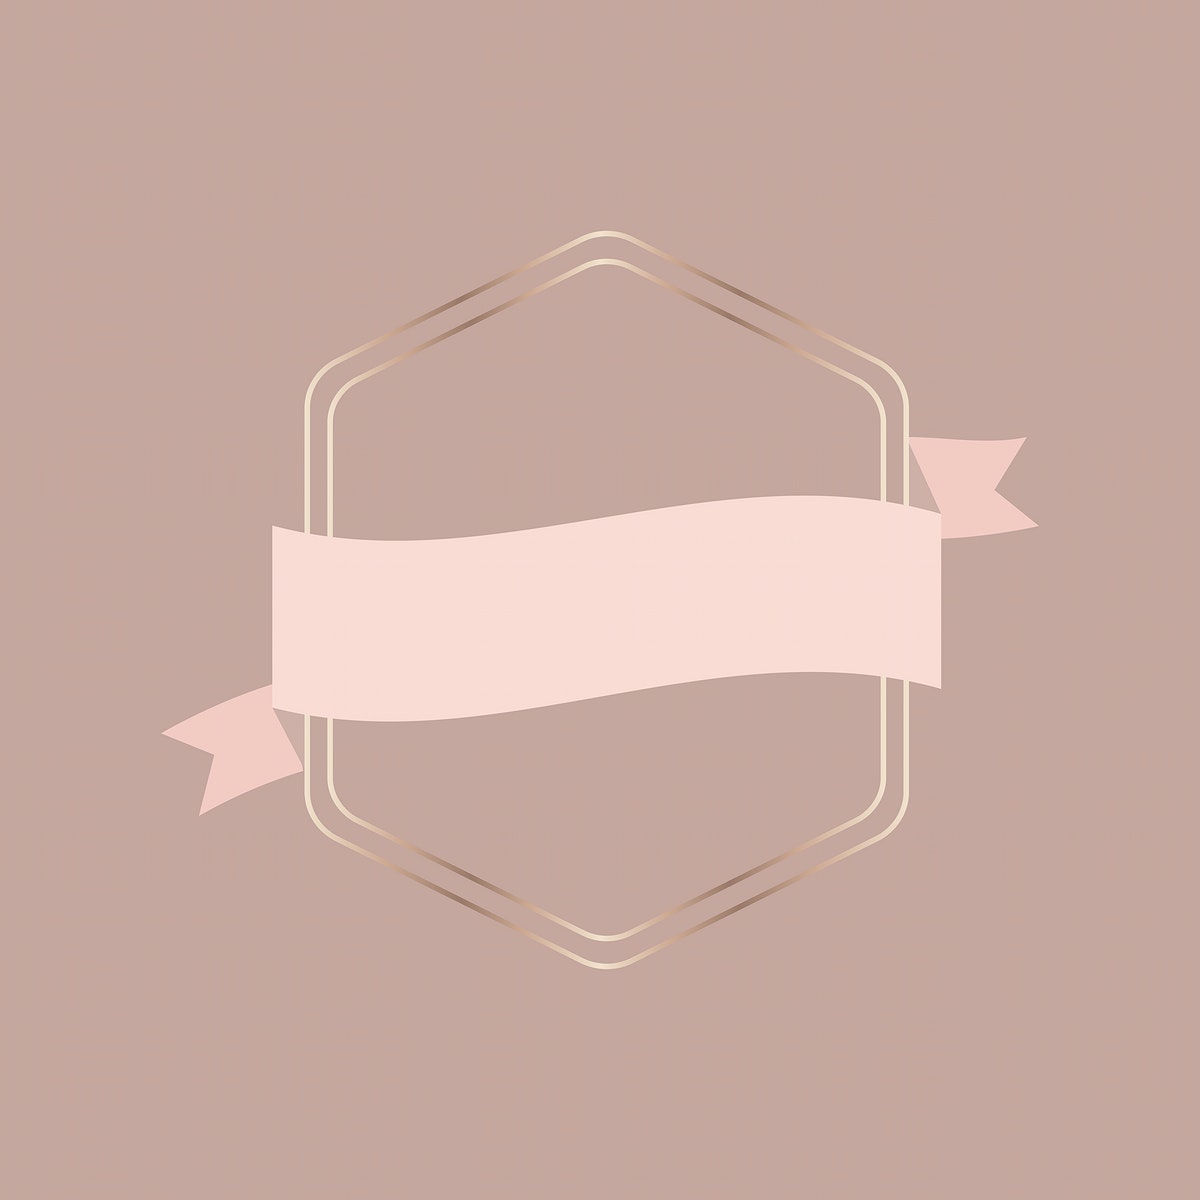 Gold frame with pink gold ribbon banner illustration